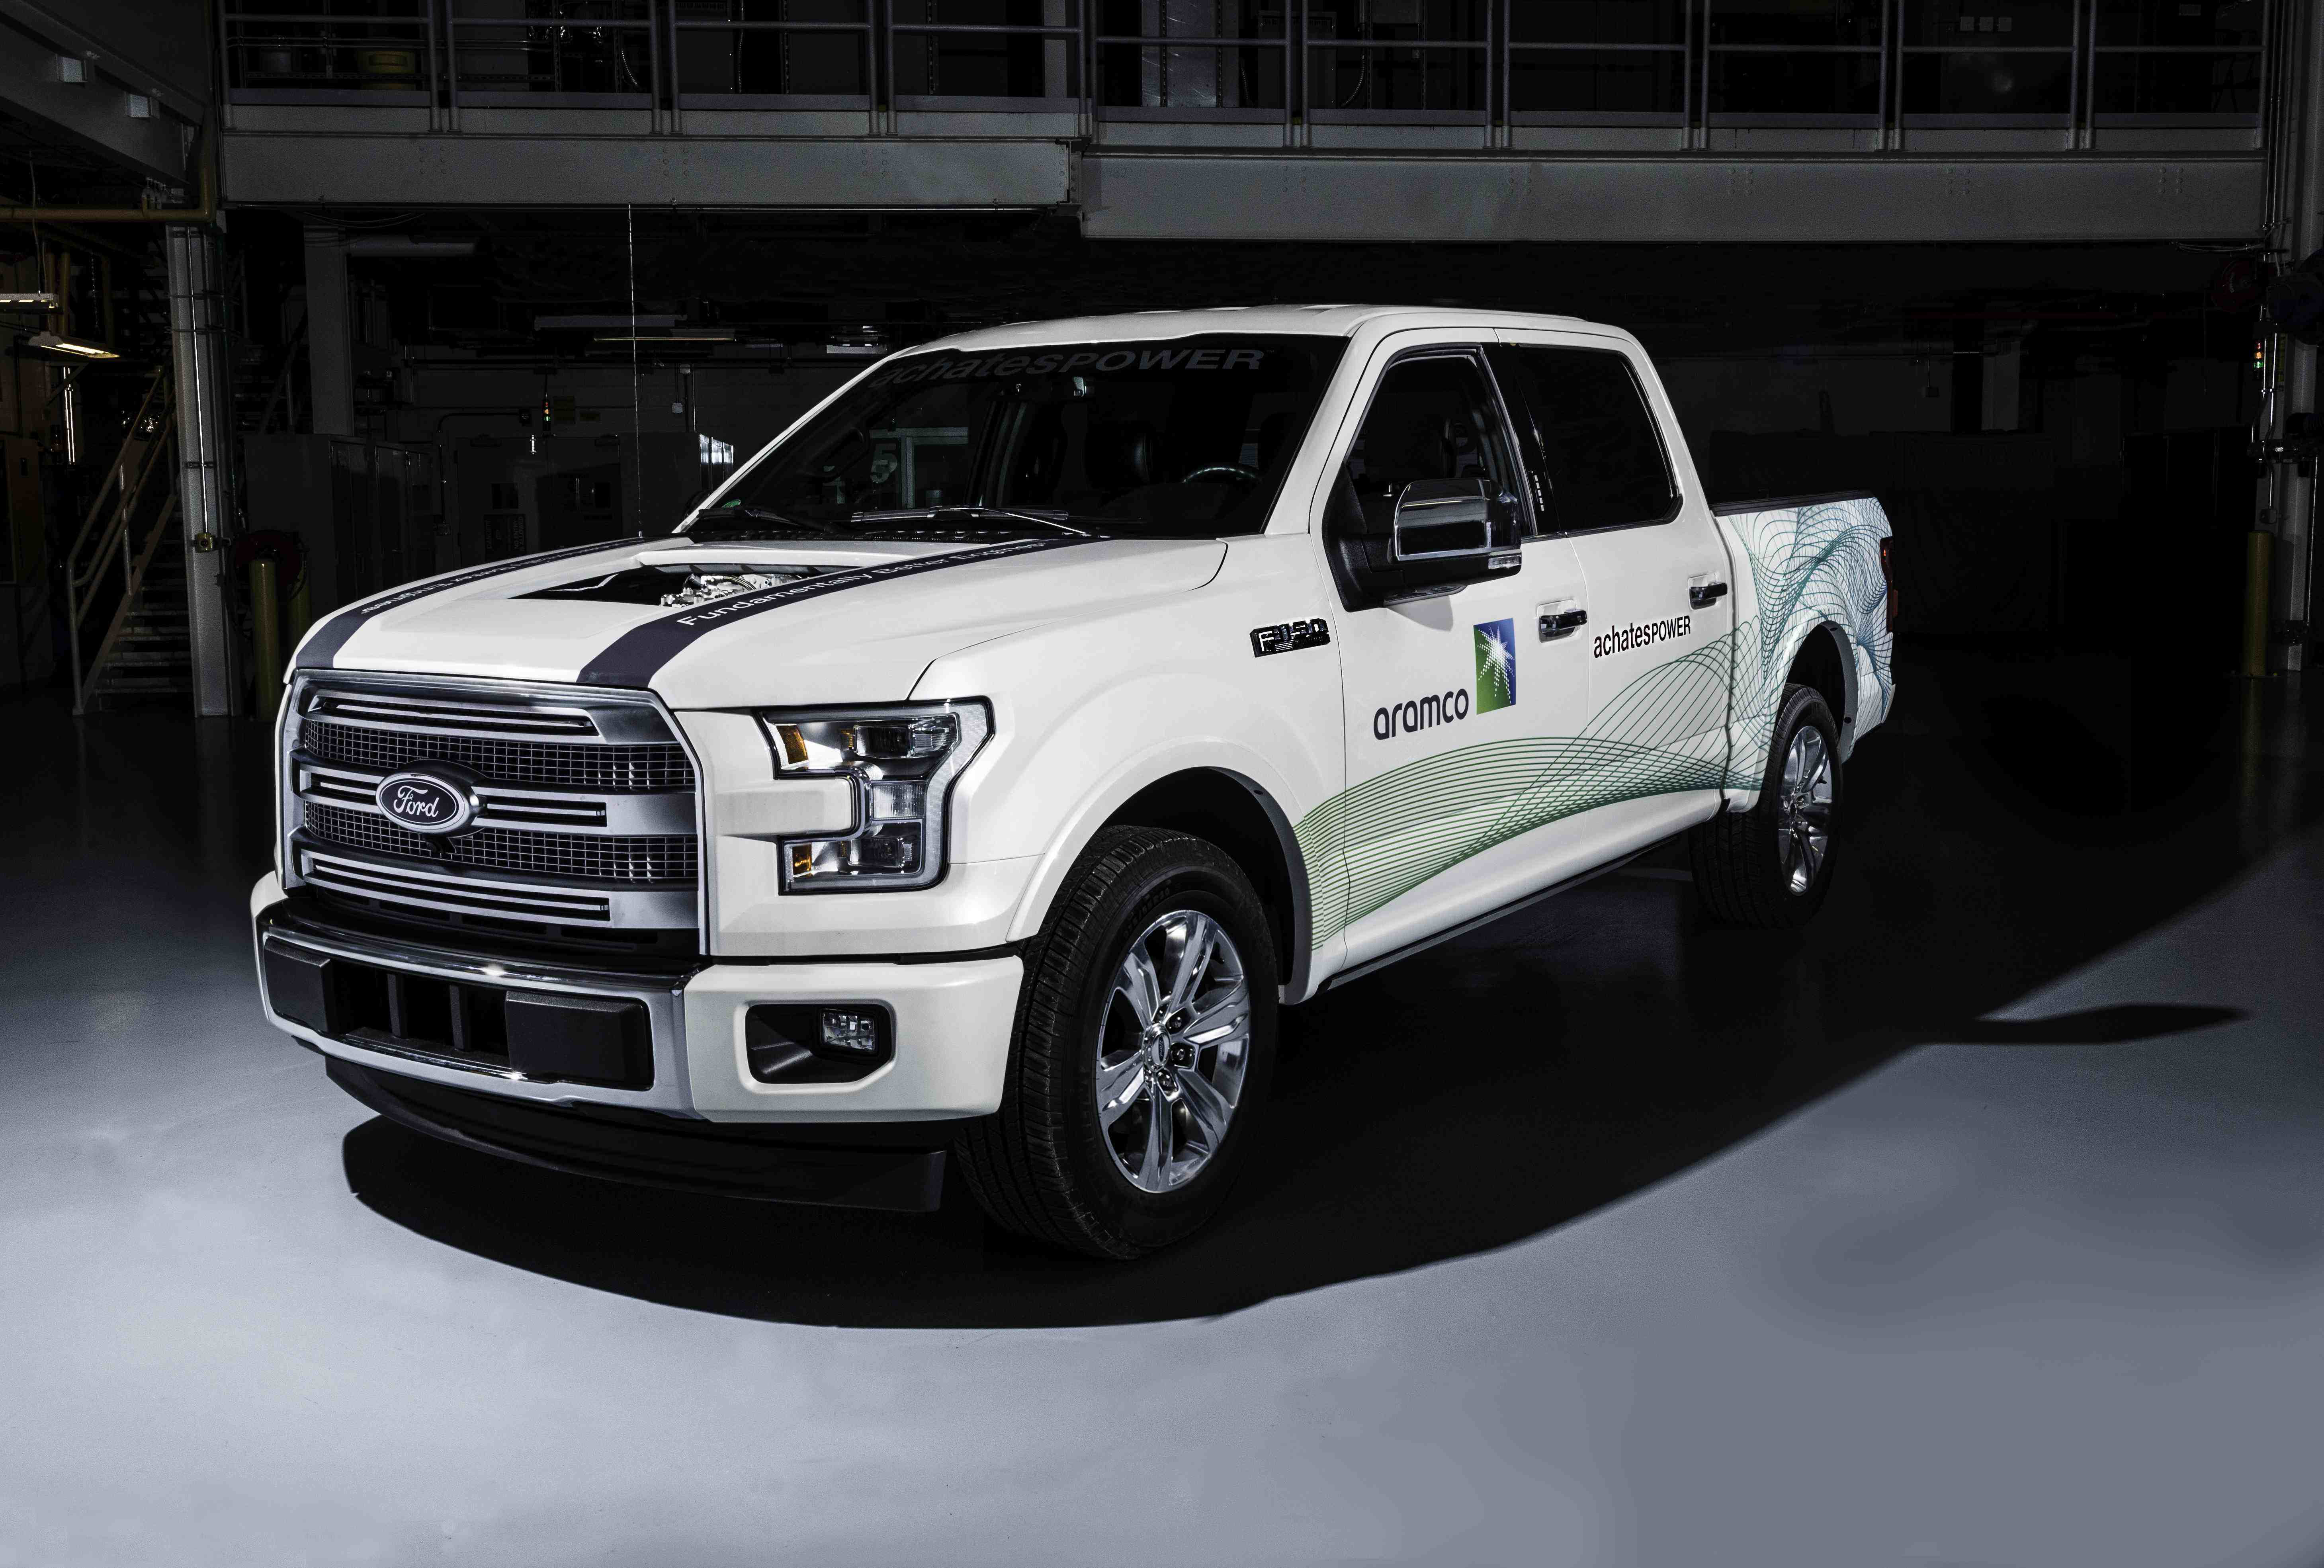 New King Of Diesel Coming Medium Duty Work Truck Info